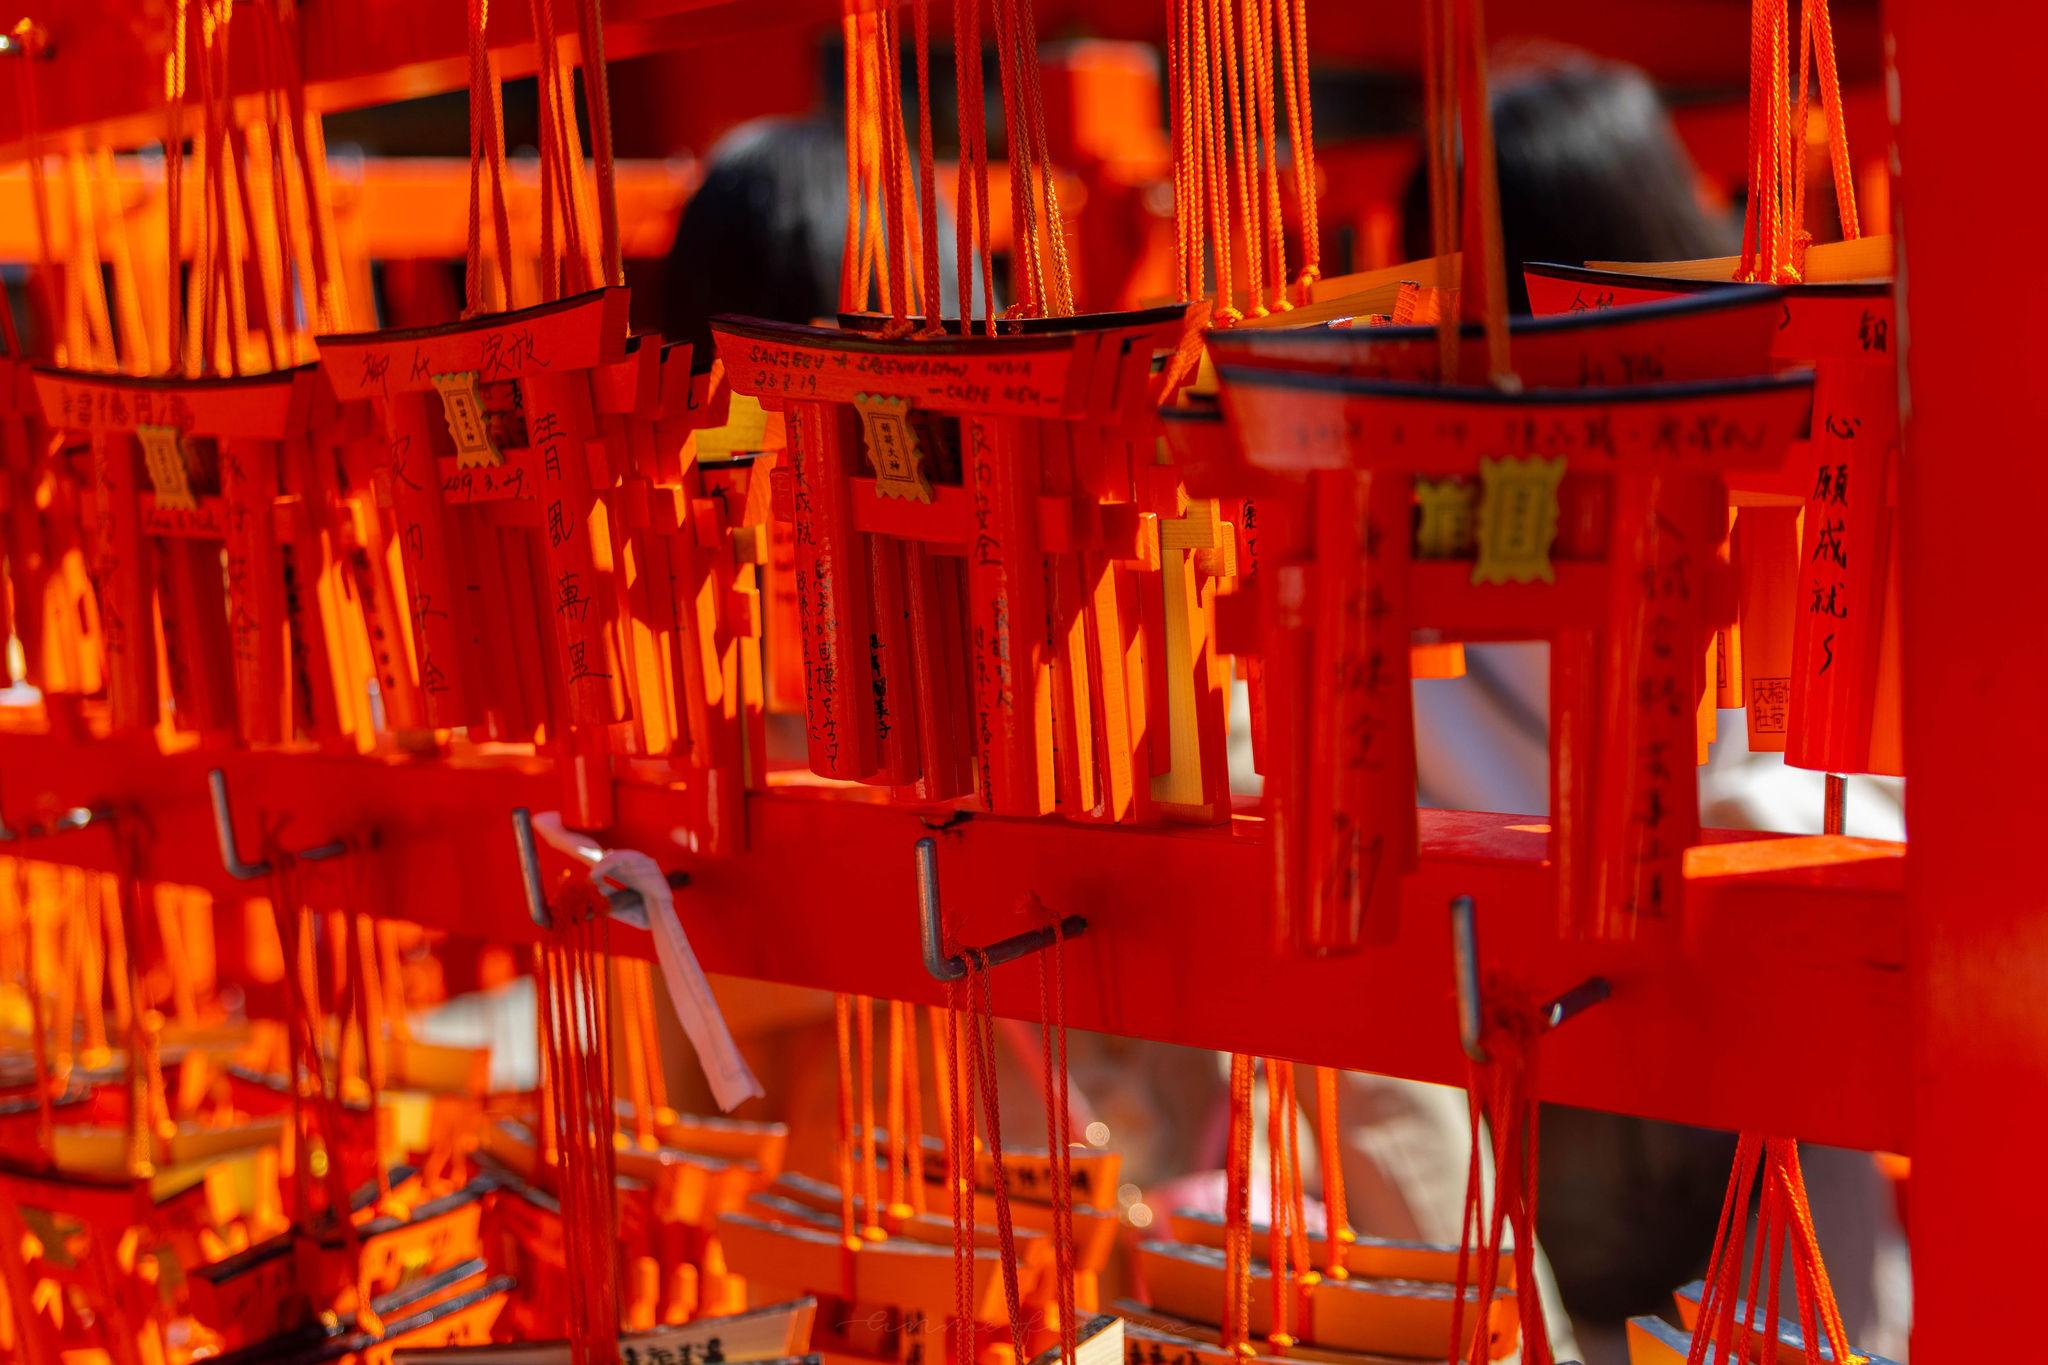 Wooden Ema Wishing Tablets Japanese Shinto Shrine Prayers Red Torii Gate Shape at Fushimi Inari Taisha in Kyoto